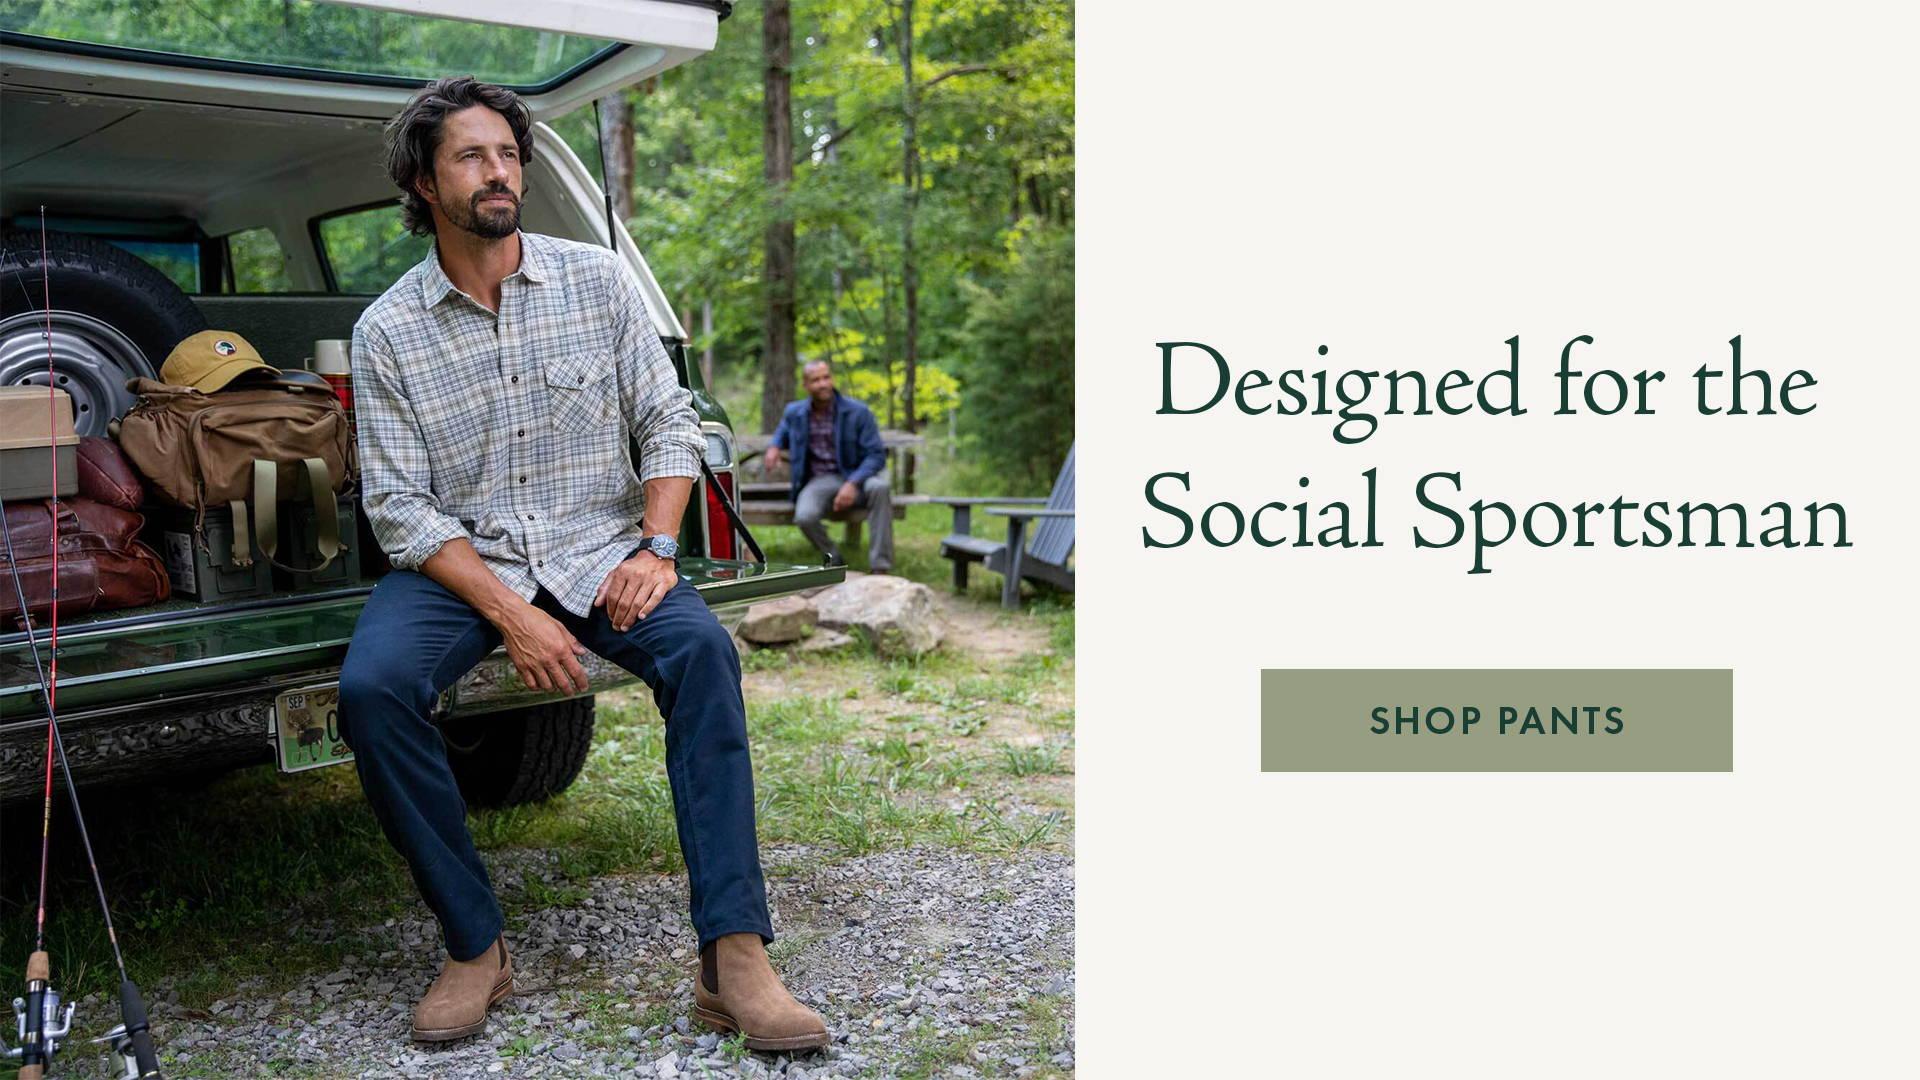 Designed for the Social Sportsman